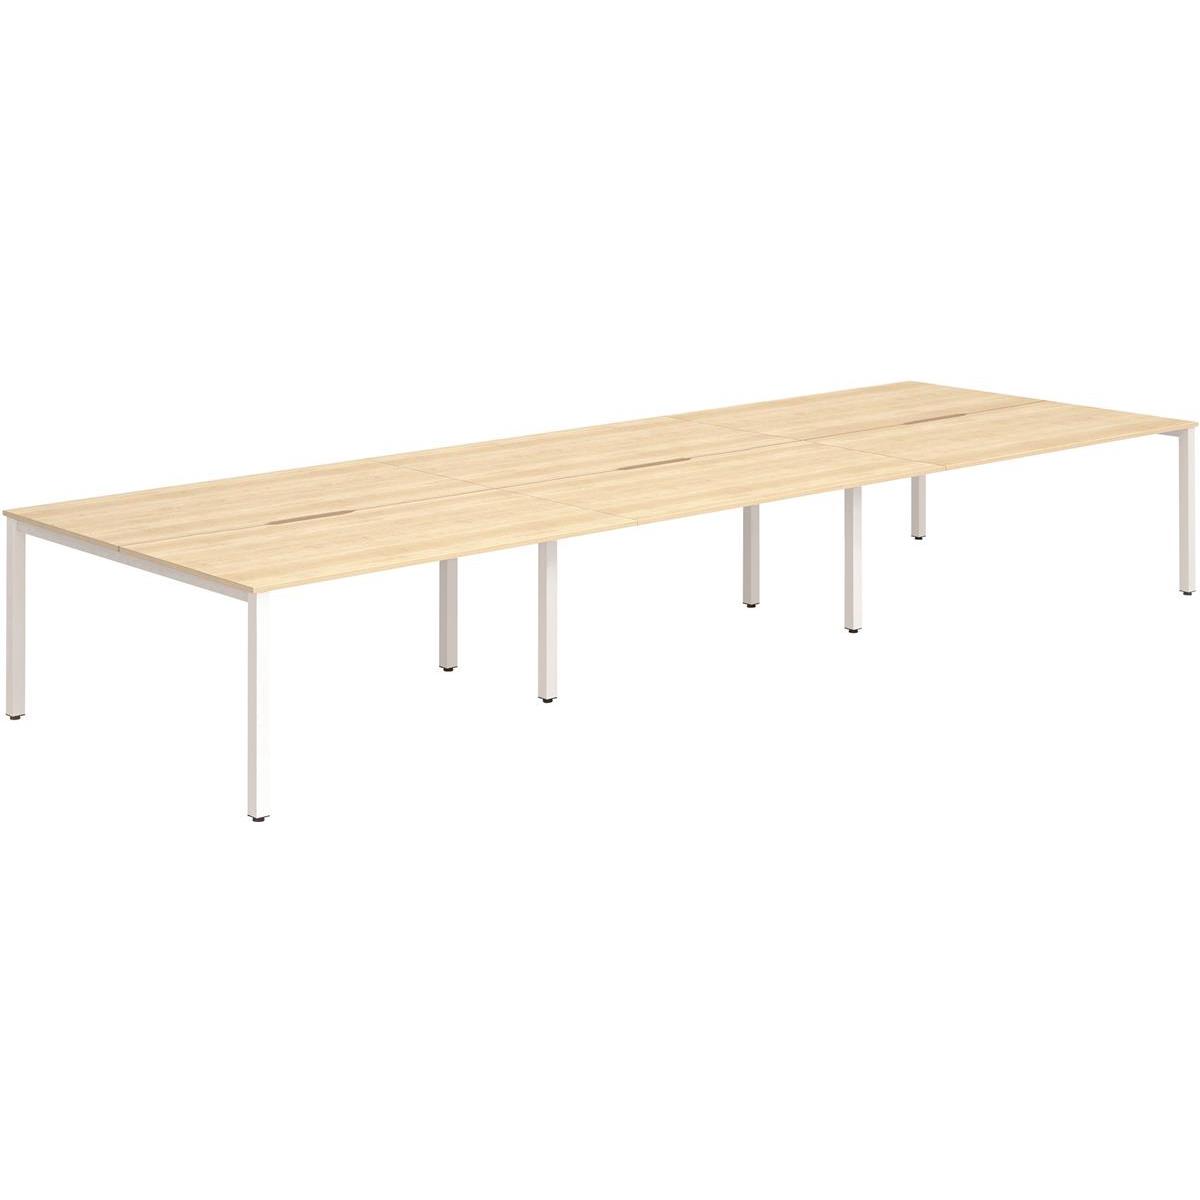 Trexus Bench Desk 6 Person Back to Back Configuration White Leg 3600x1600mm Maple Ref BE276